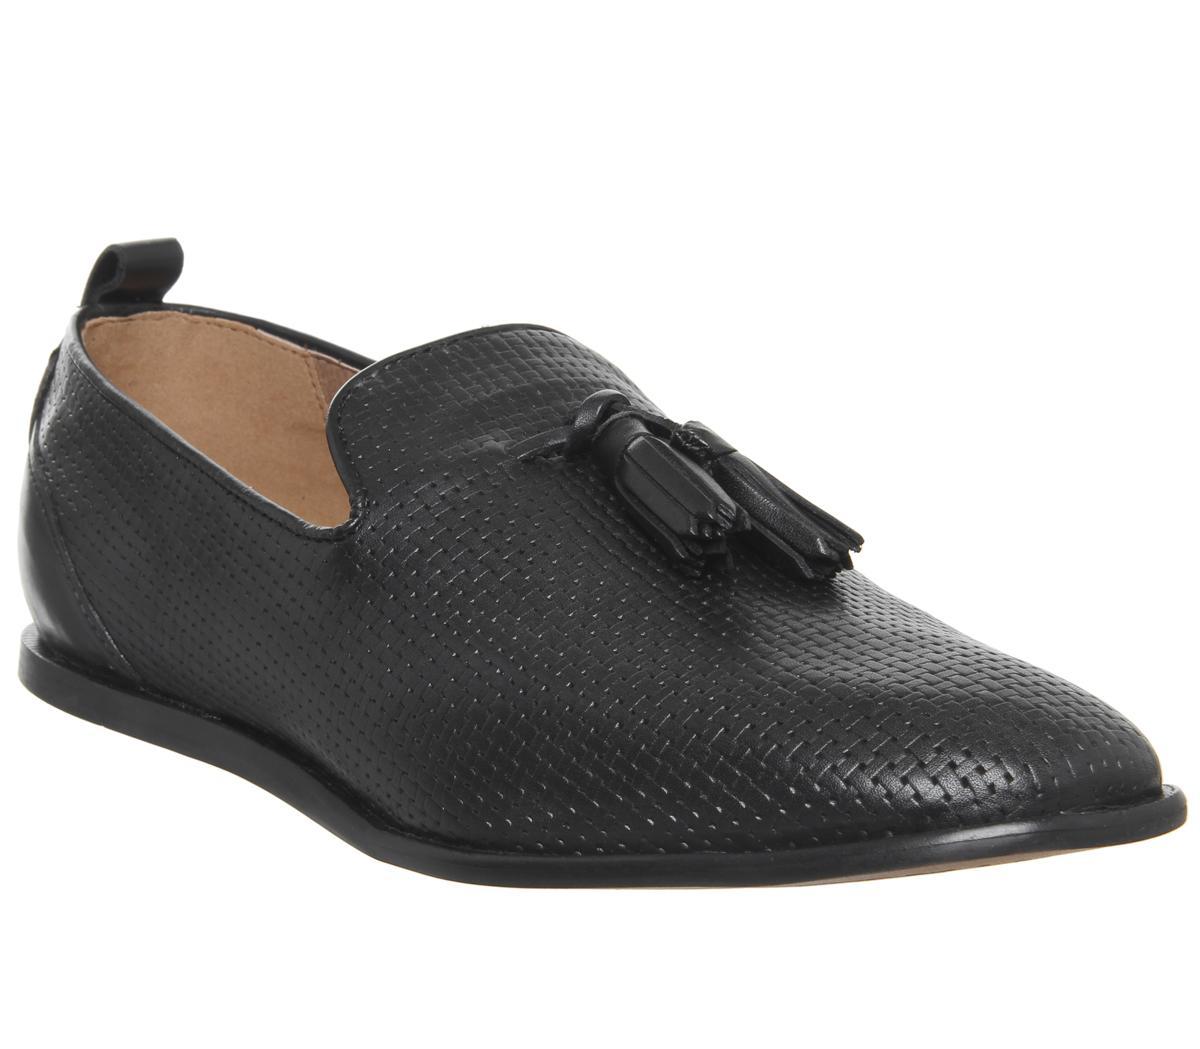 Comber Tassel Loafers